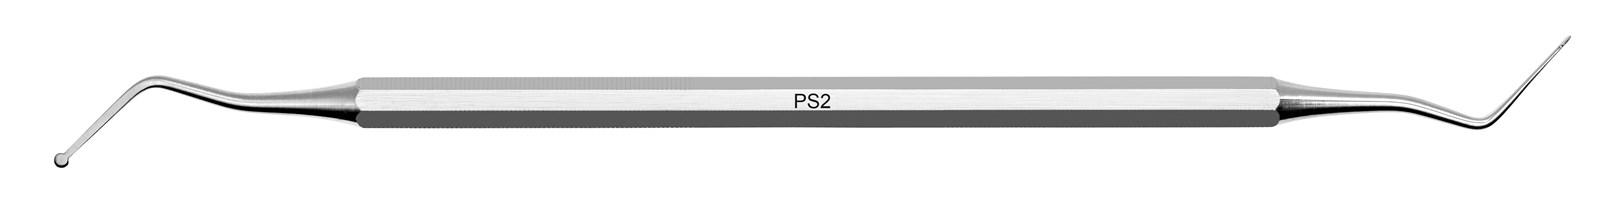 Mikrochirurgický nůž - PS2, ADEP červený